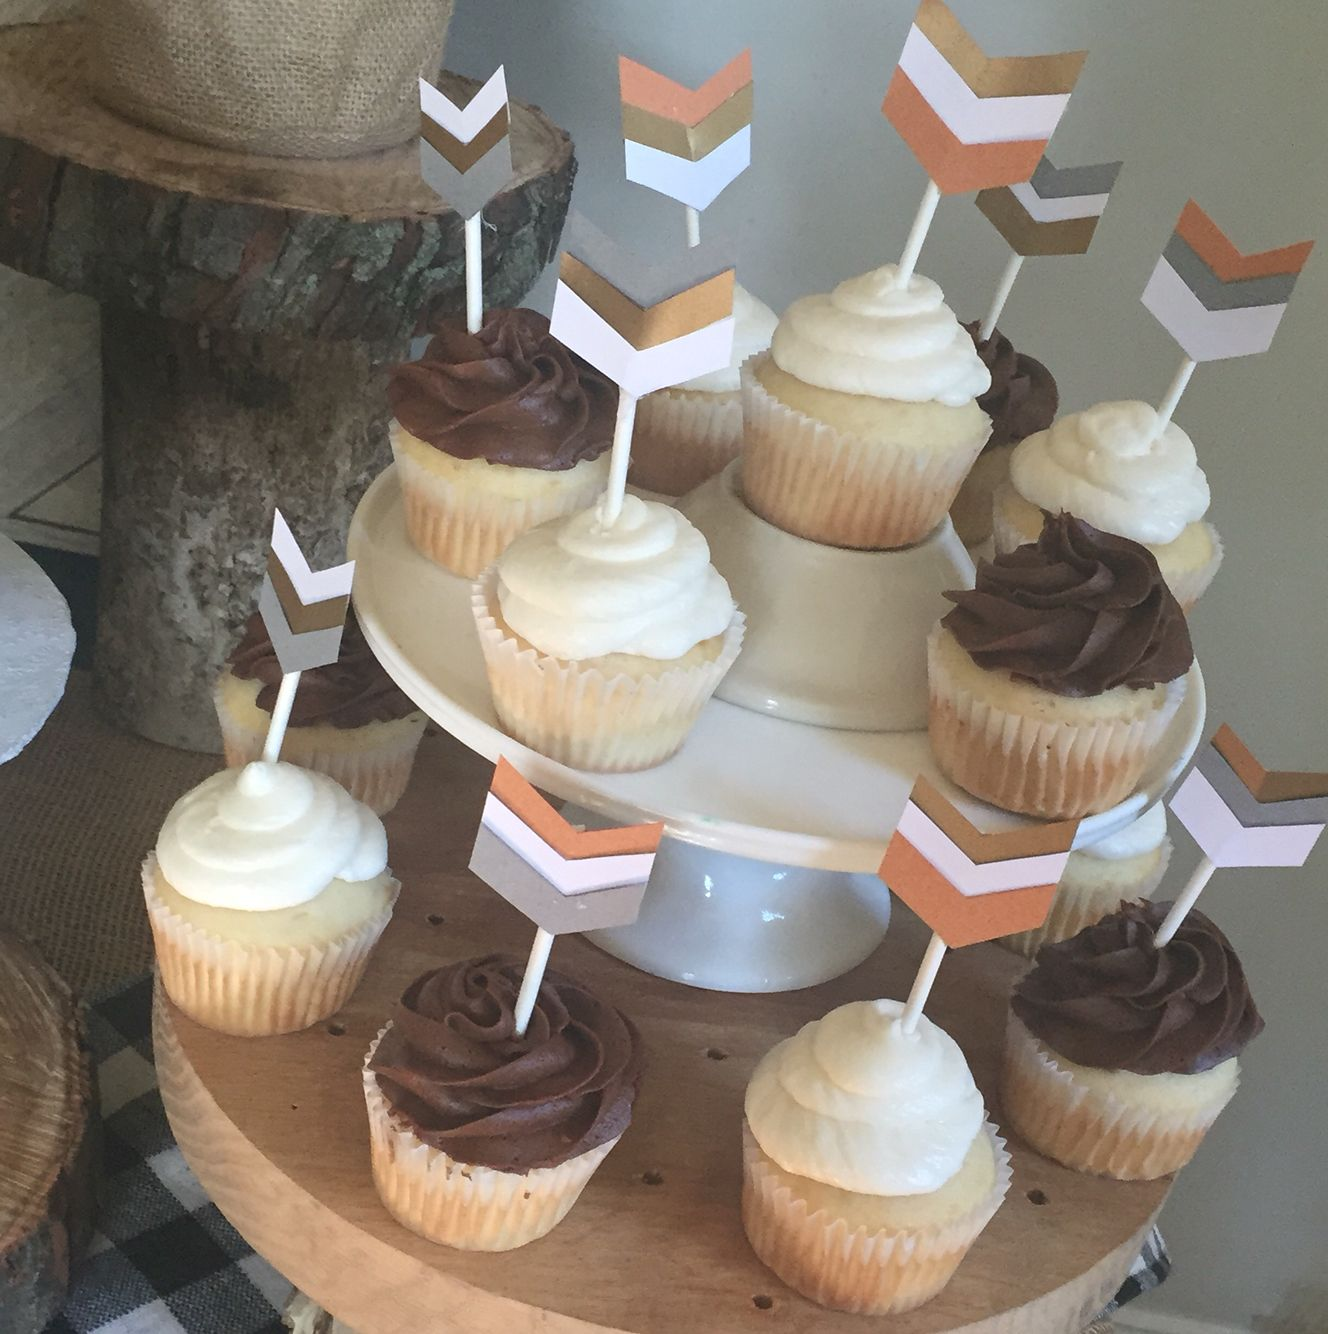 Arrow cupcakes.